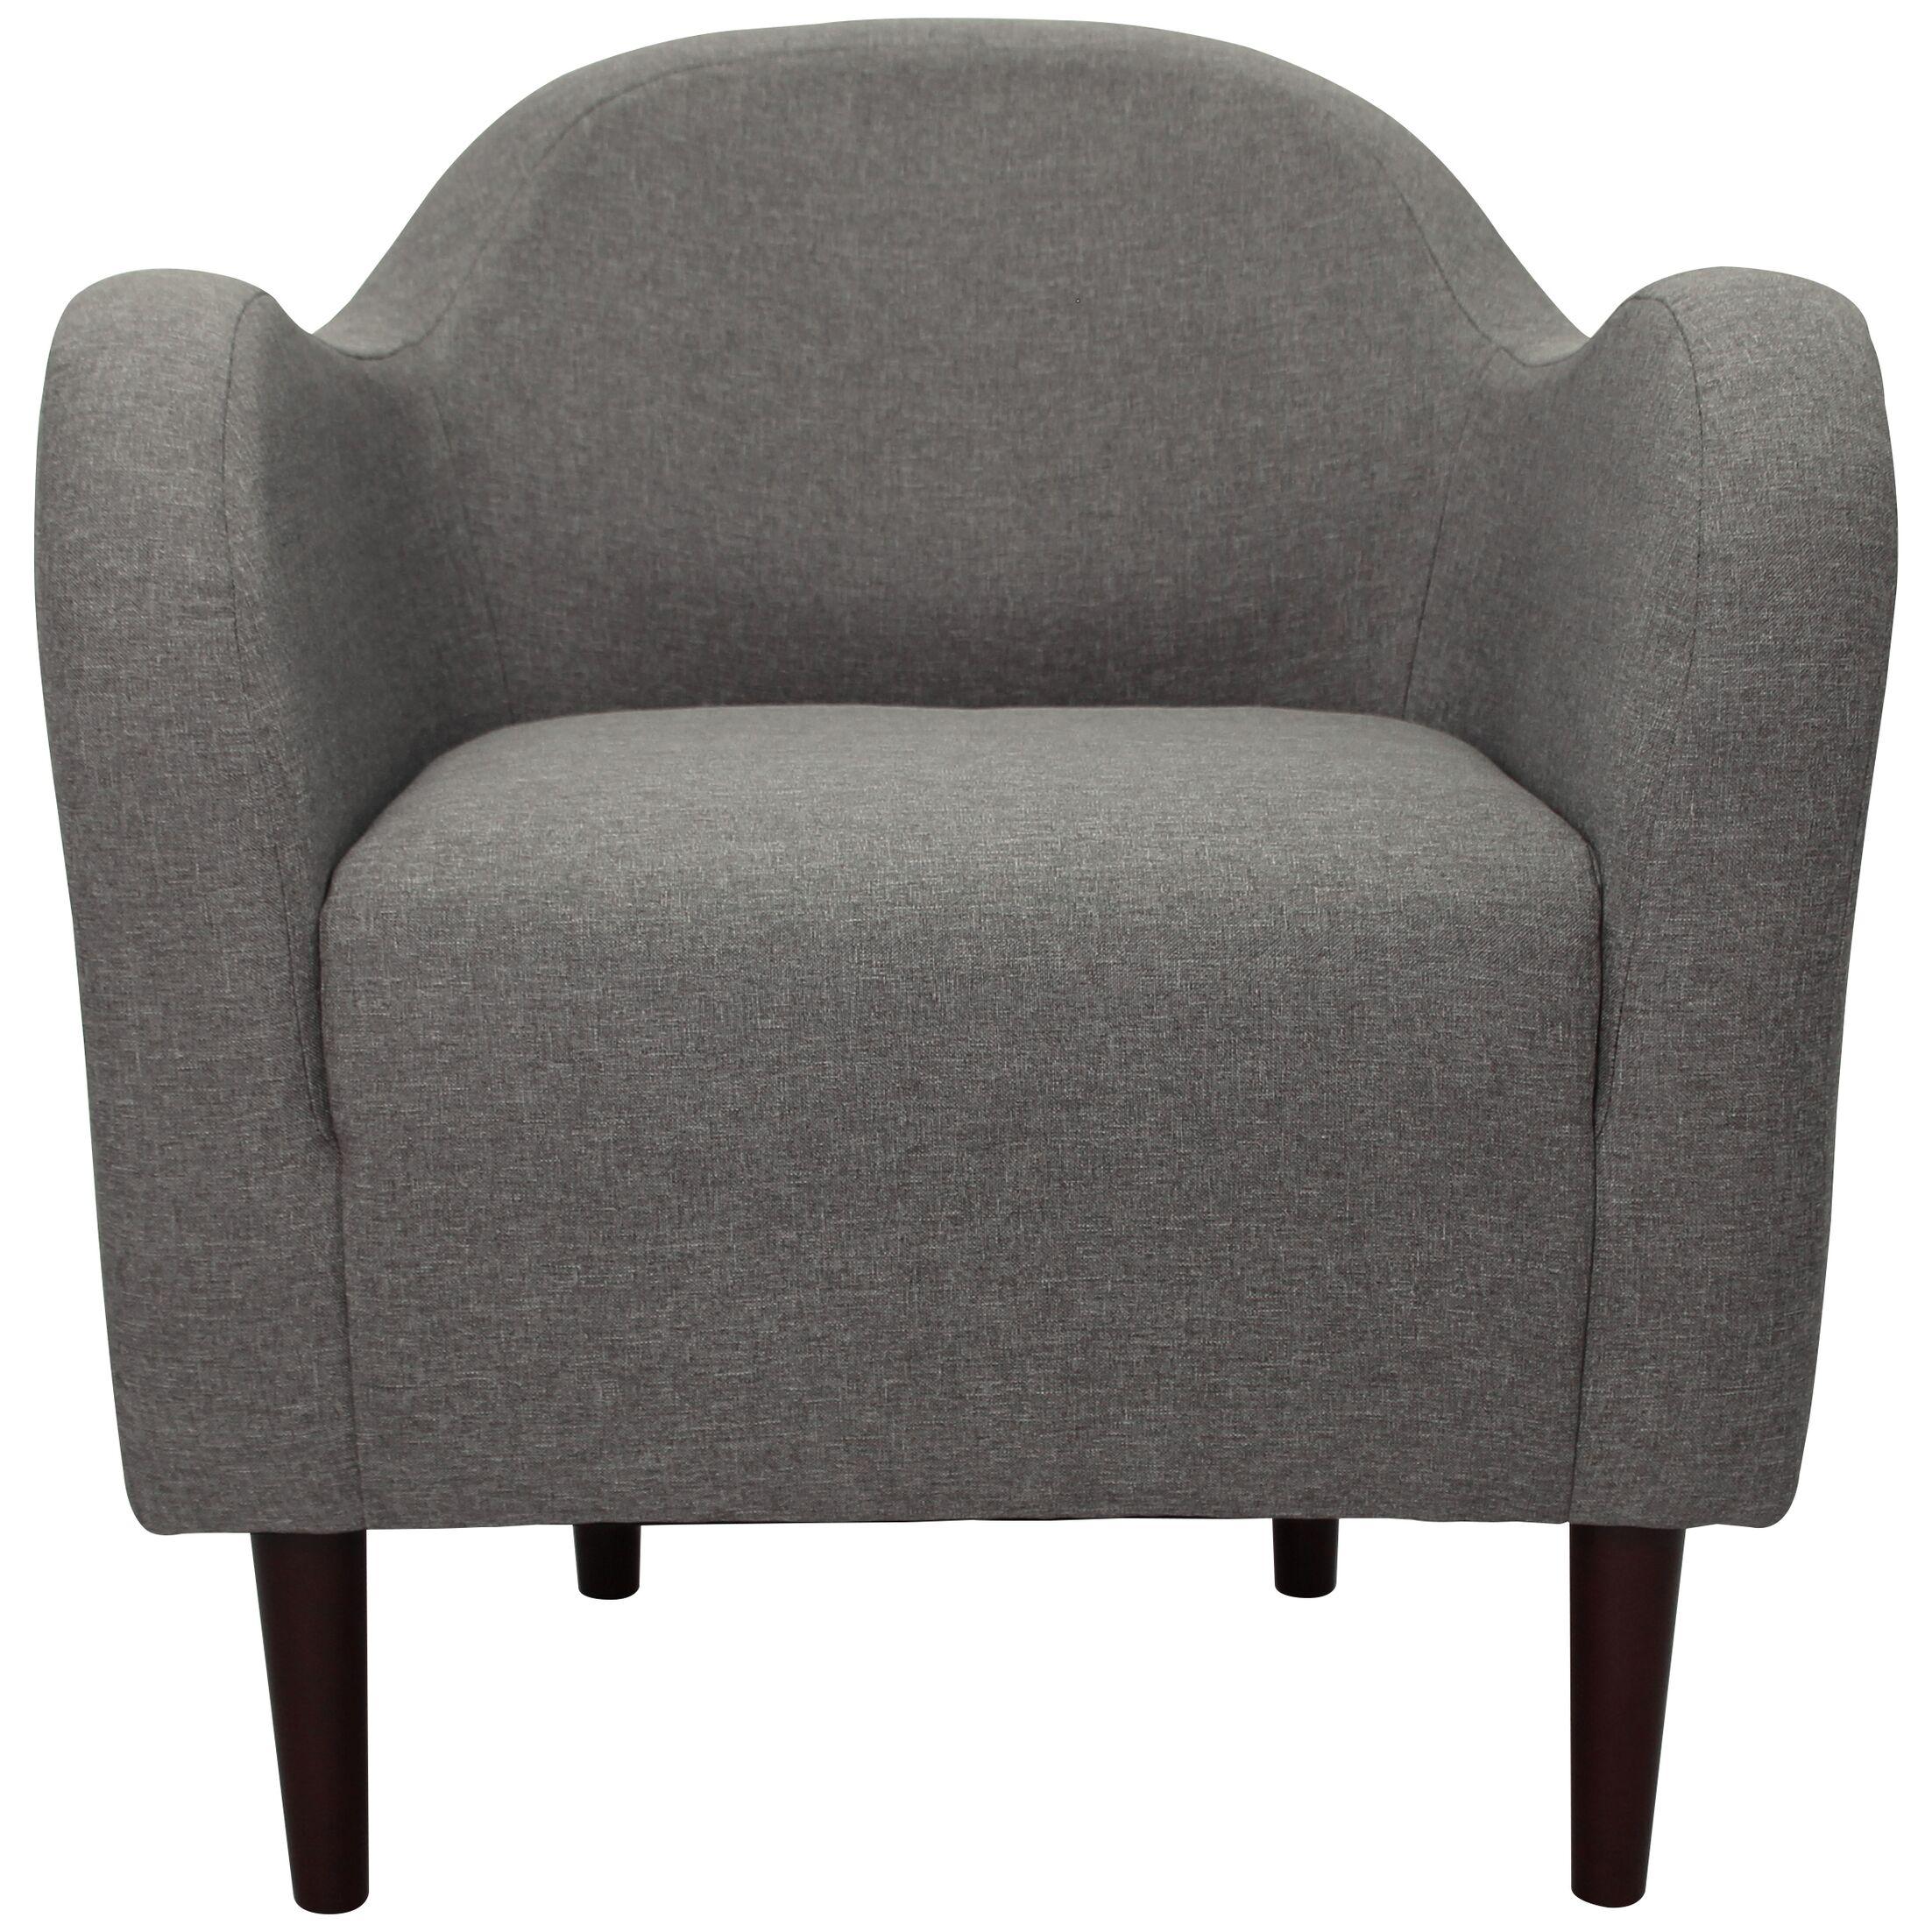 Reider Mid Century Armchair Upholstery: Quartz